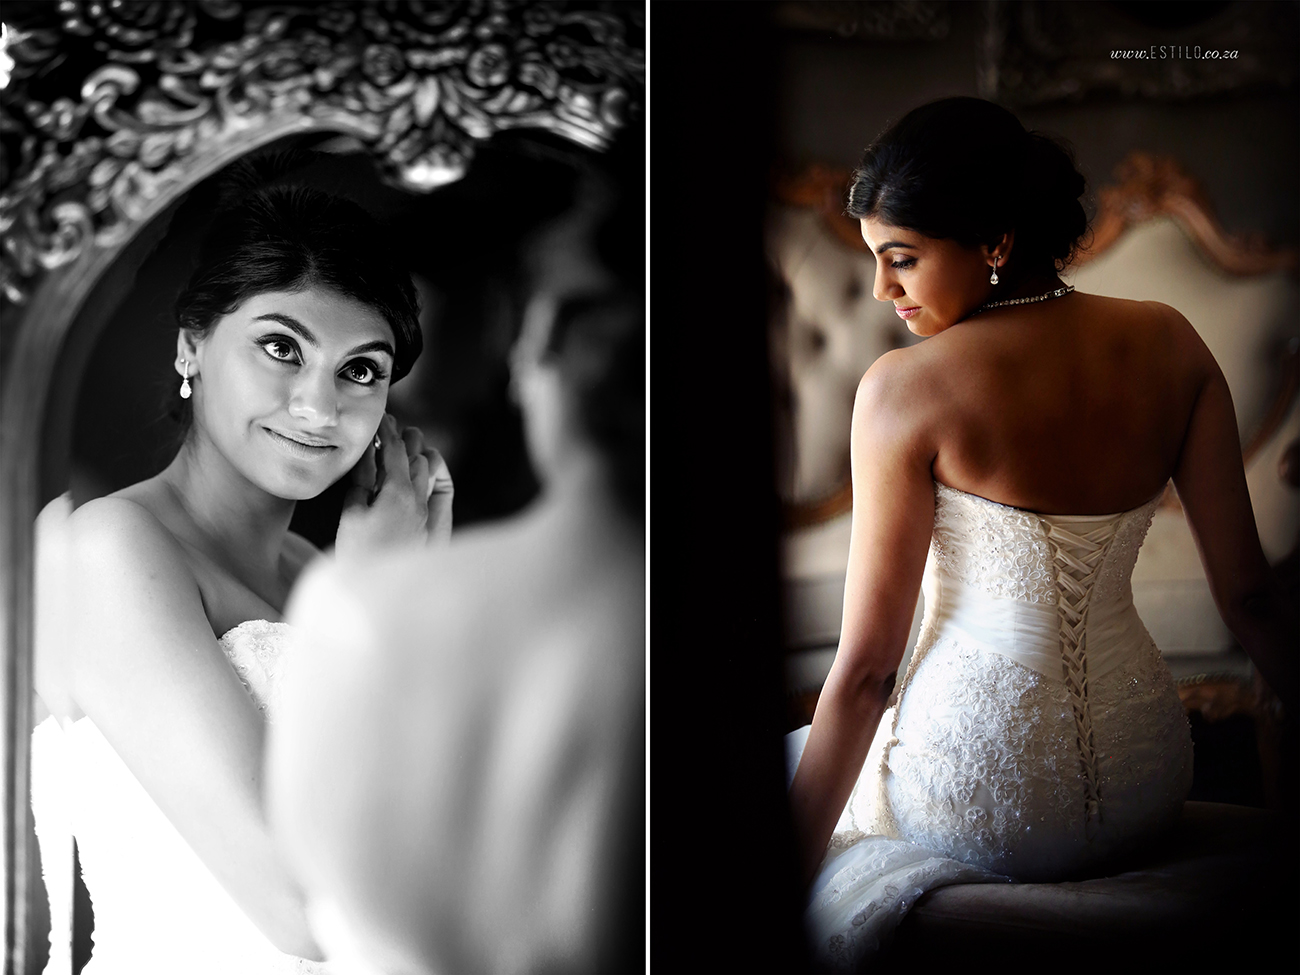 memoire-wedding-photograpgers-weddings-at-memoire-muldersdrift-best-wedding-photographers-gauteng-best-wedding-photographers-south-africa_0009.jpg